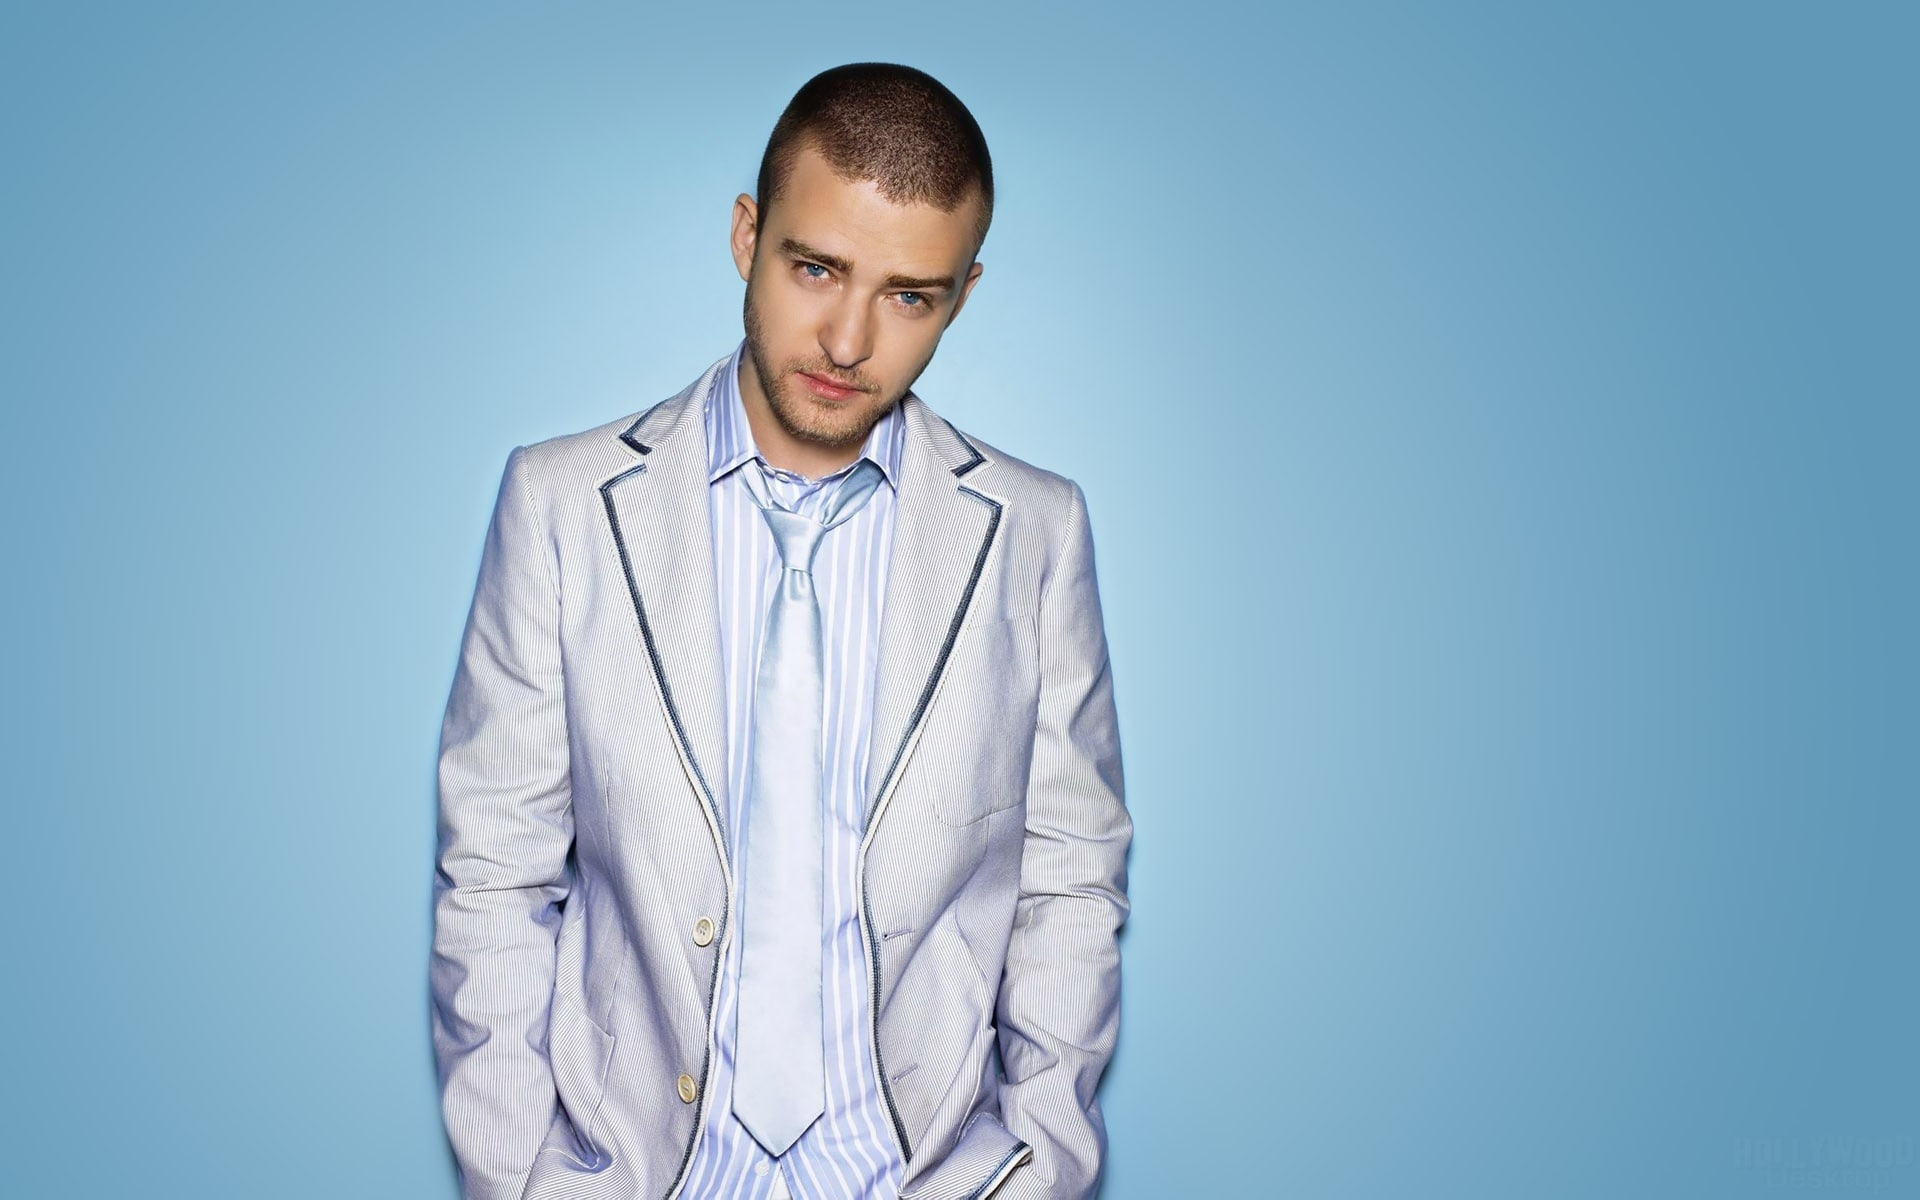 Justin Timberlake HD pictures